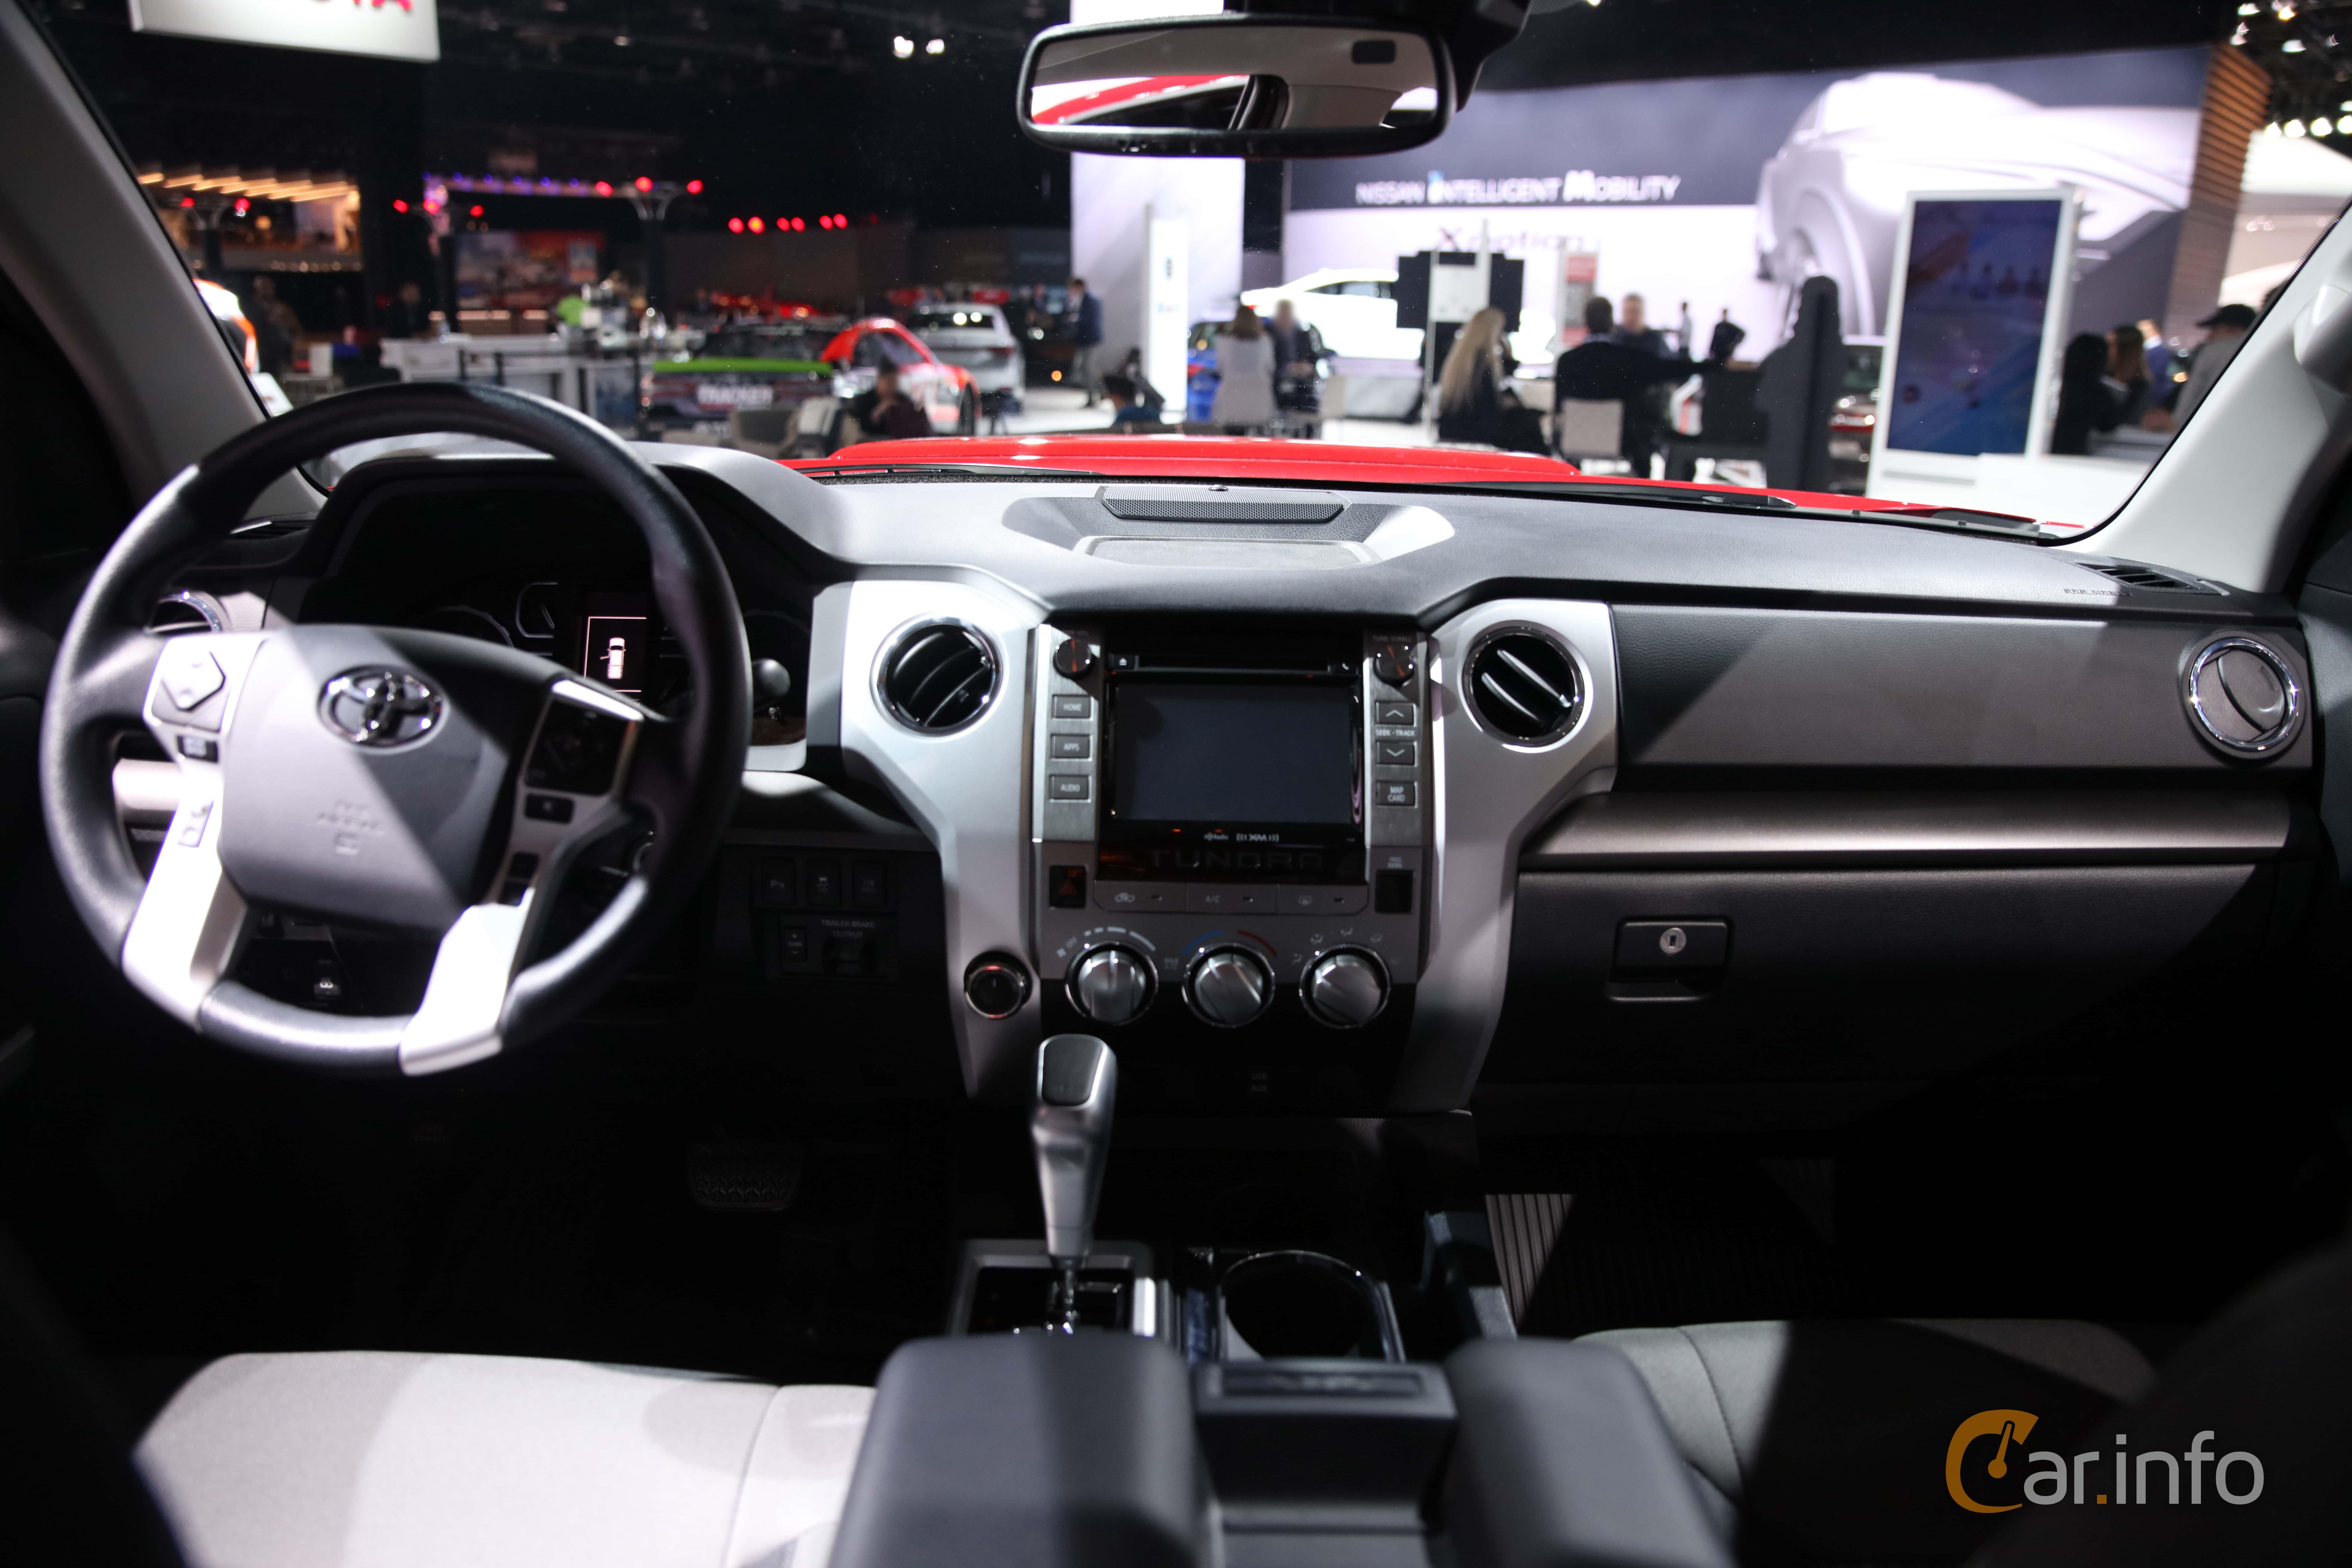 interiors tundra lnterior new the crewmax toyota interior car